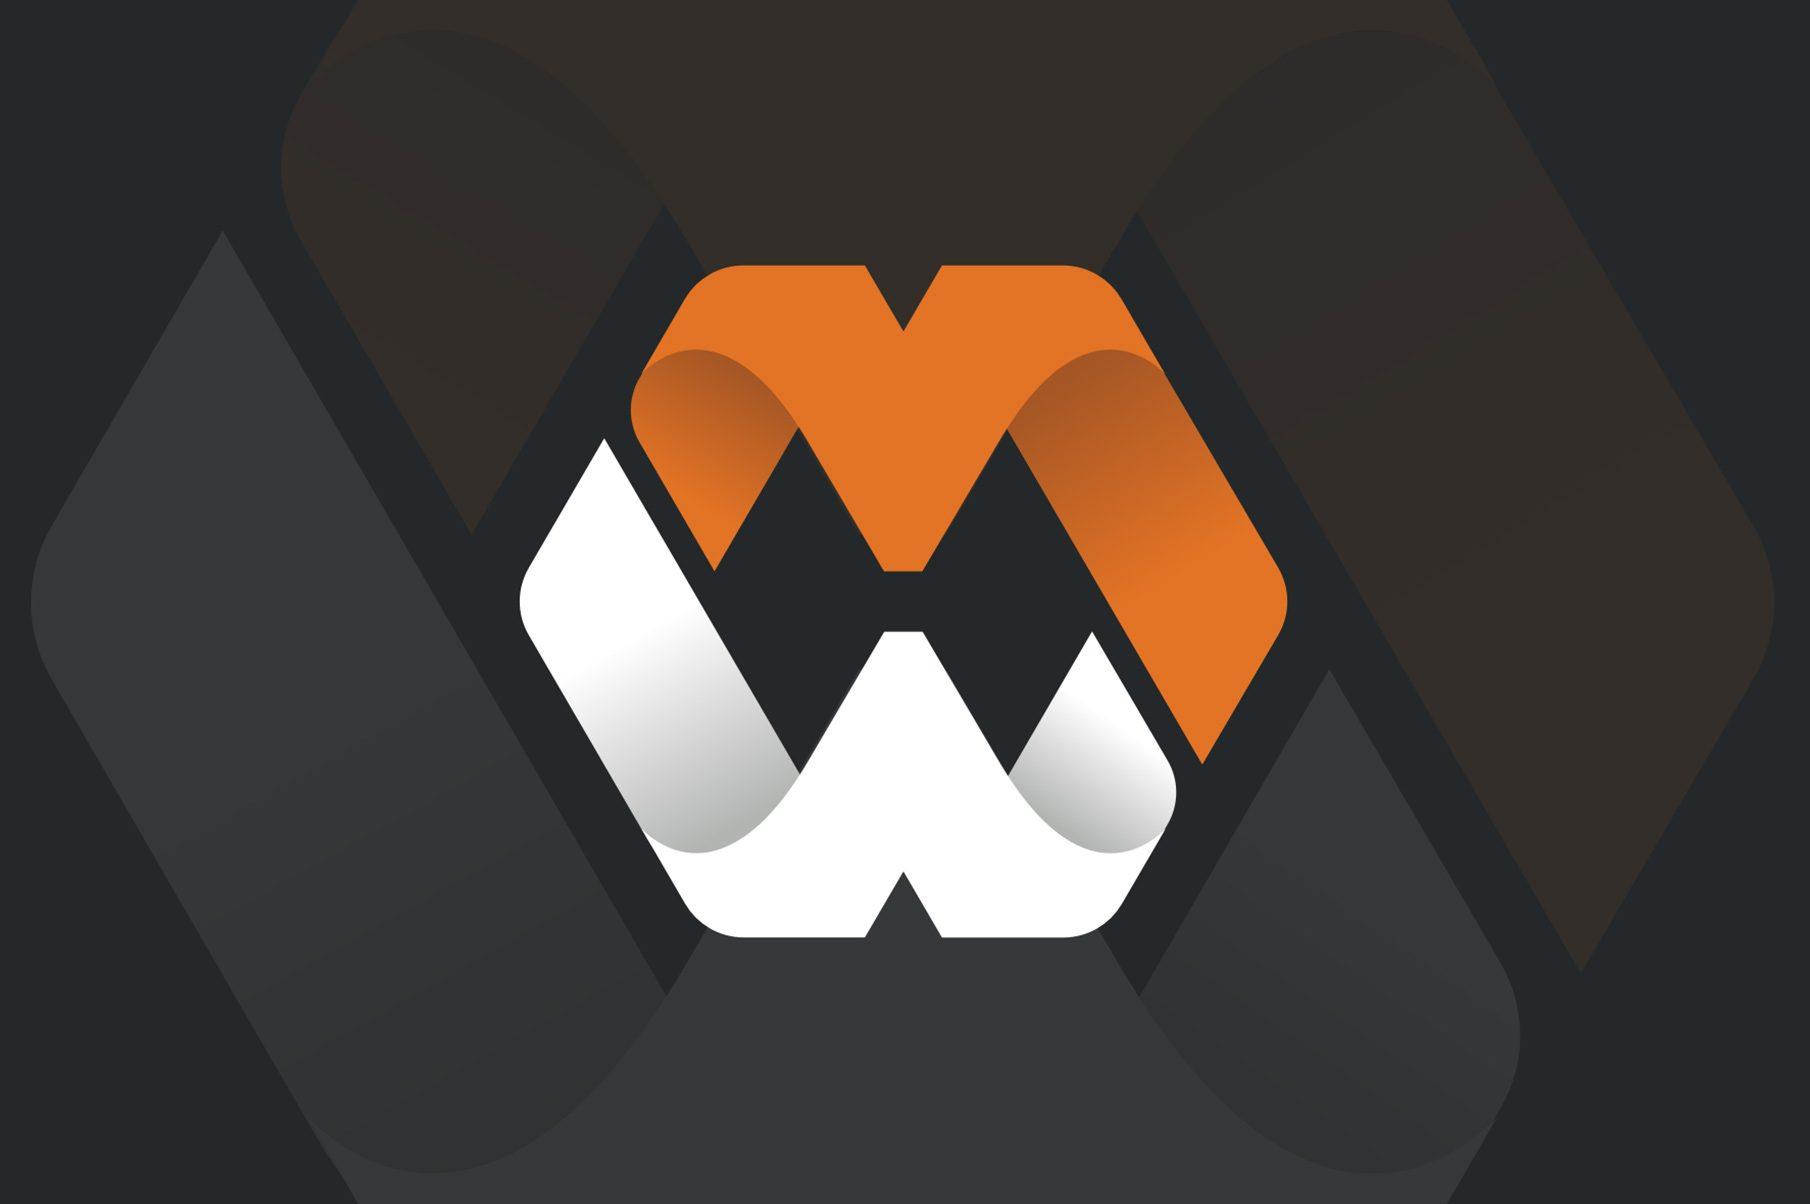 Wma Newsroom Placeholder